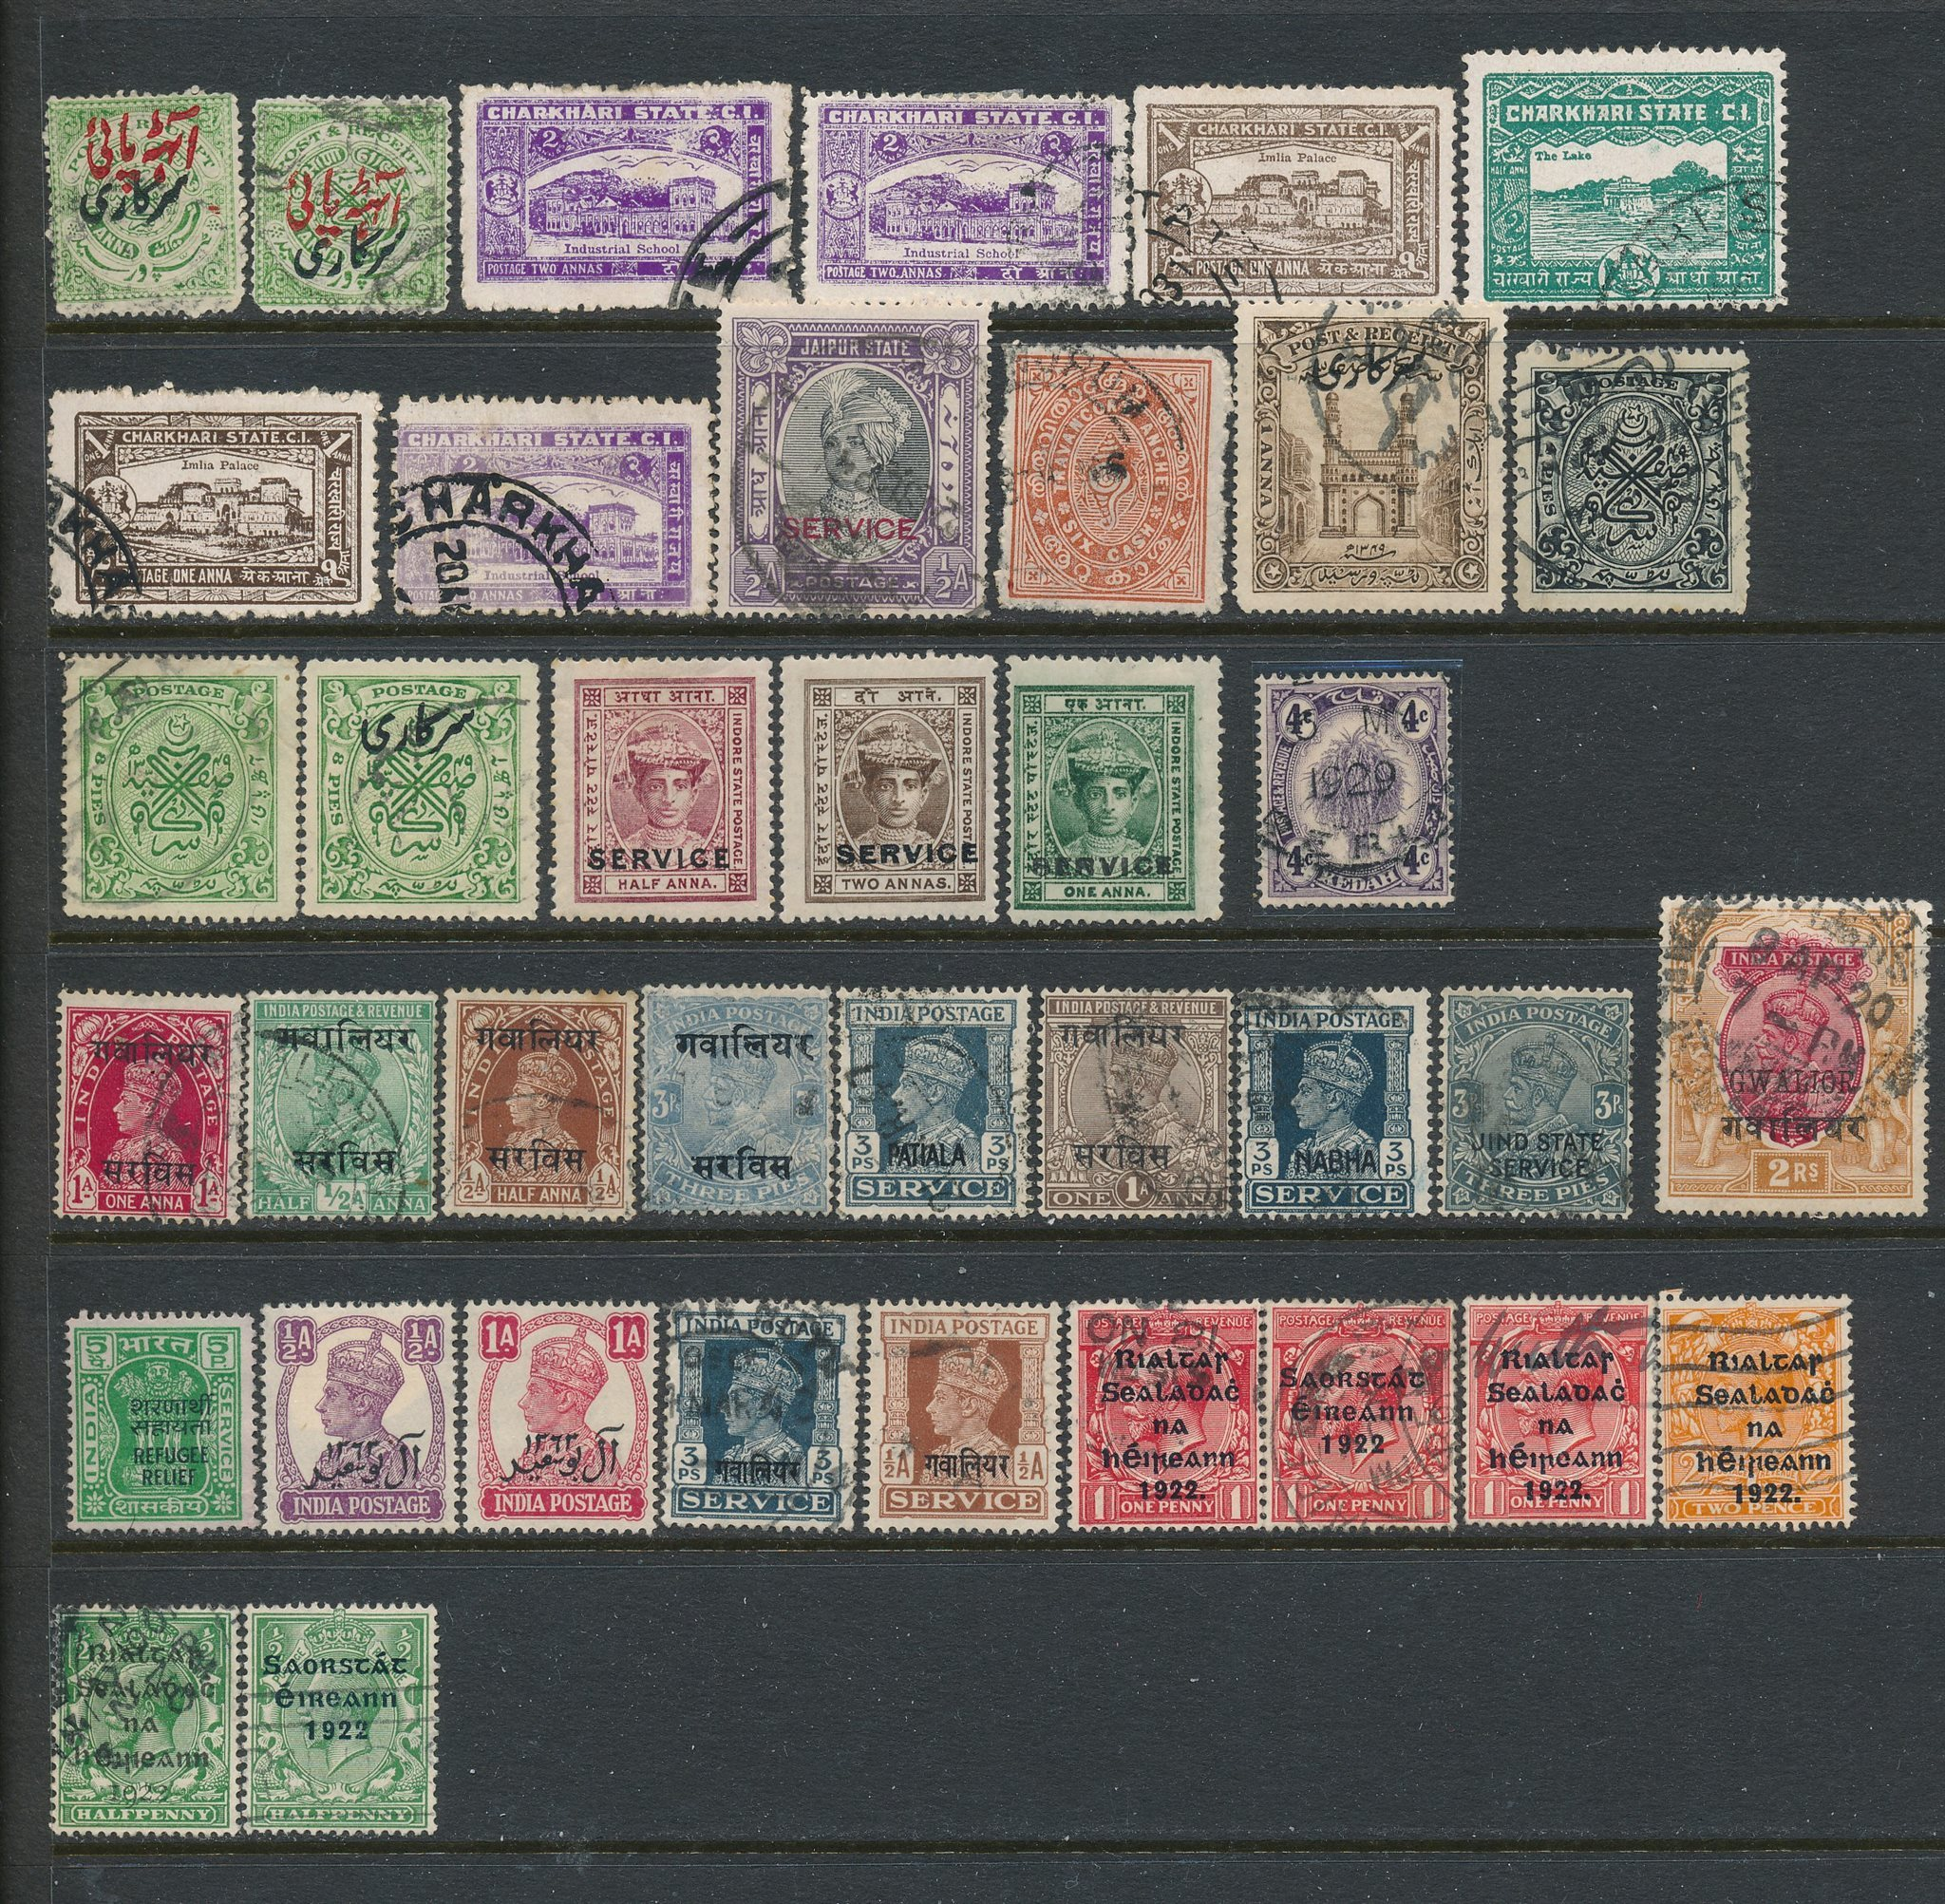 Diverse Indiska Delstater 1 Blad Stamplat 338648659 ᐈ Kop Pa